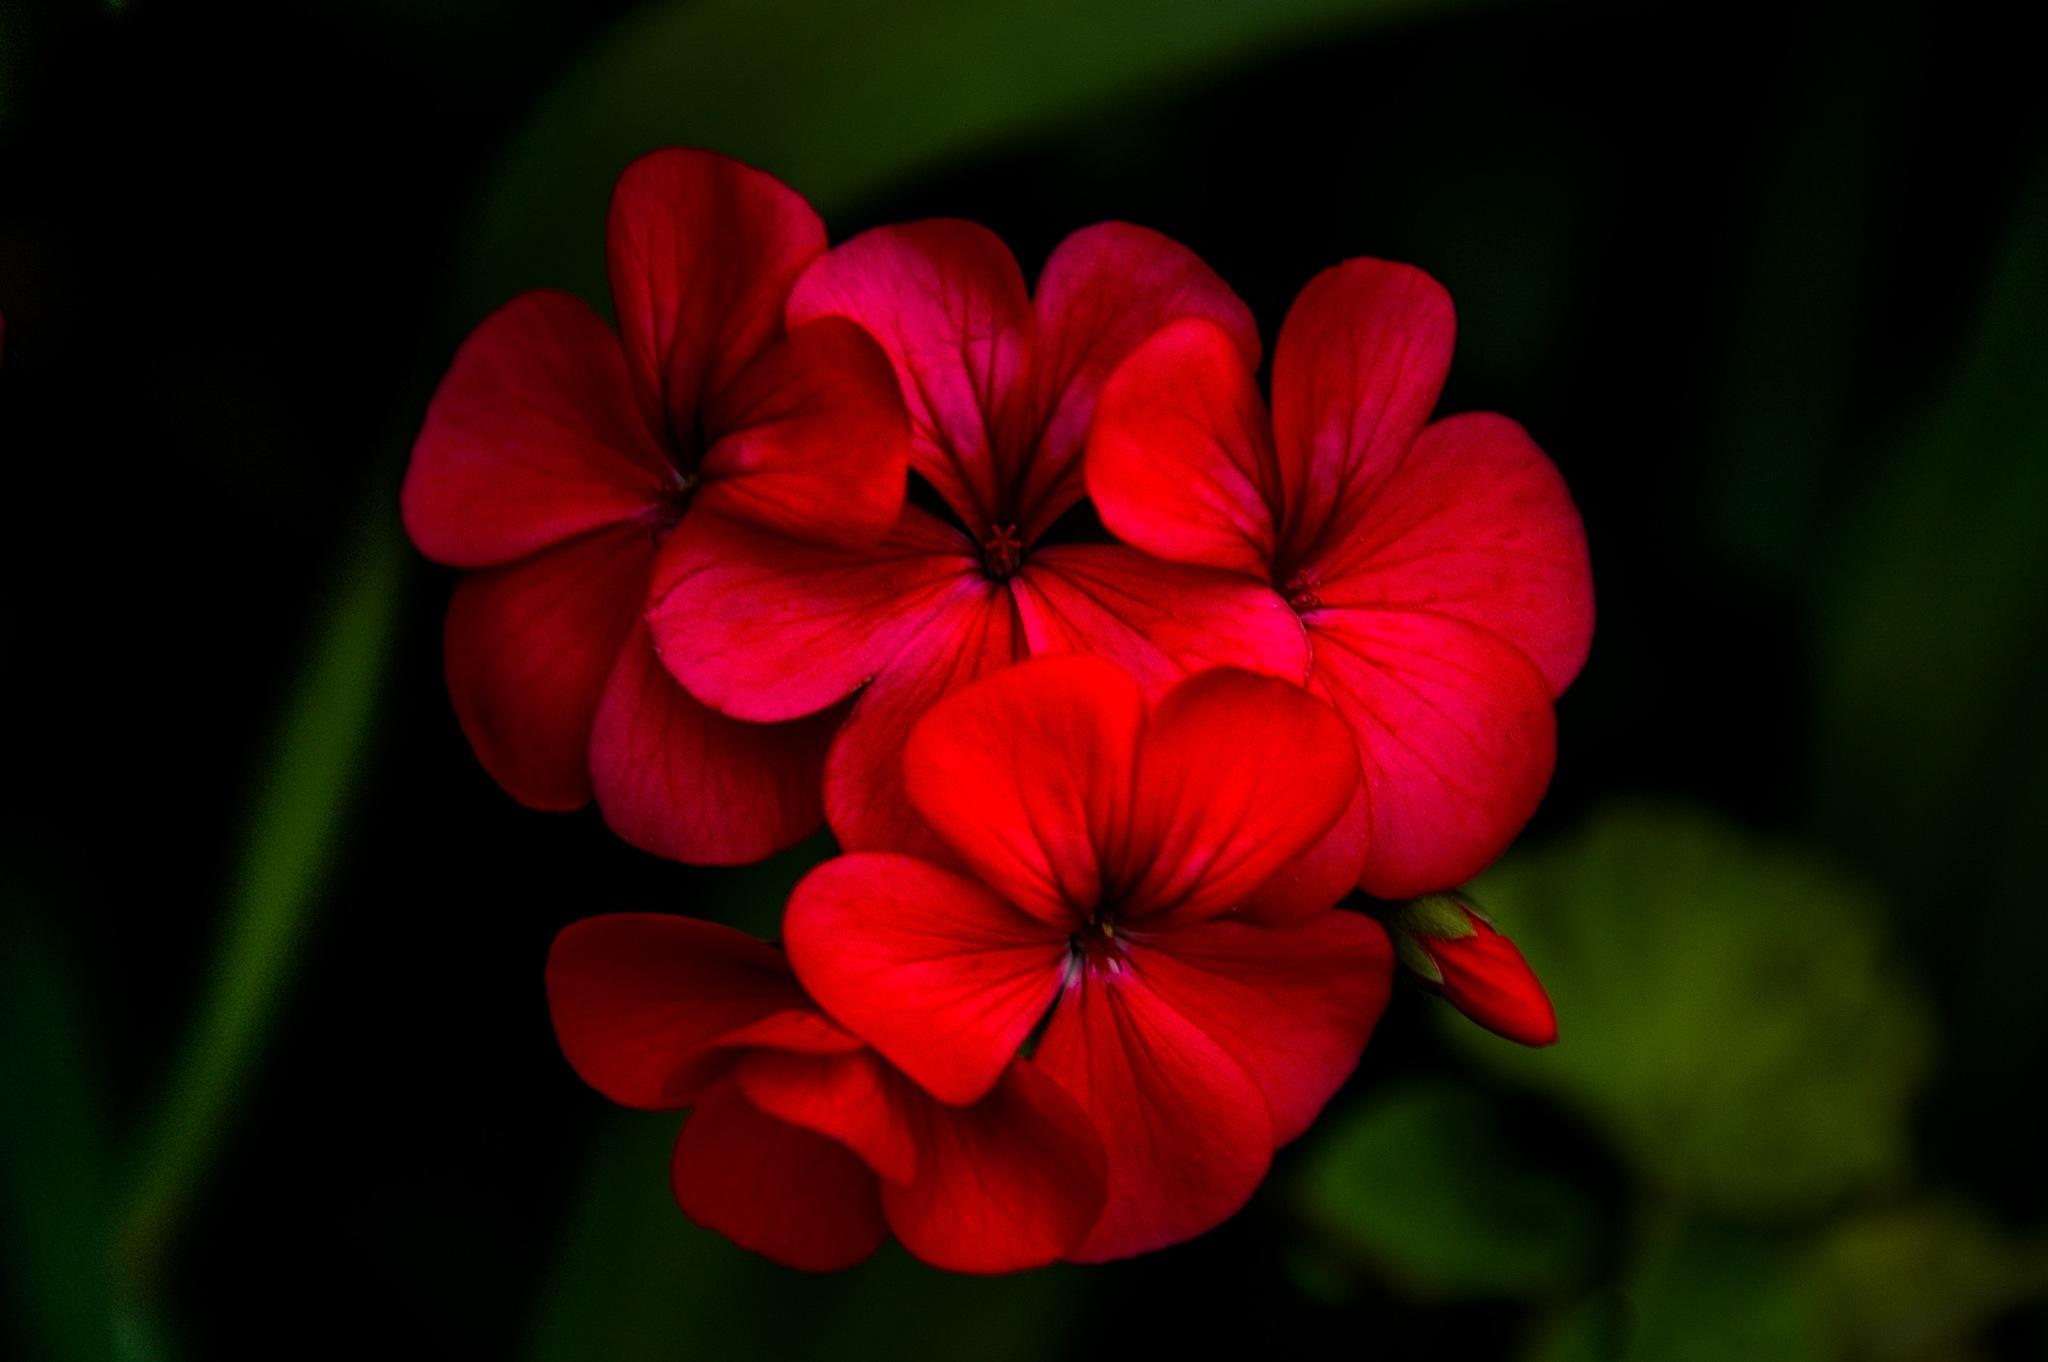 geranium by sonny_roger_sonneland